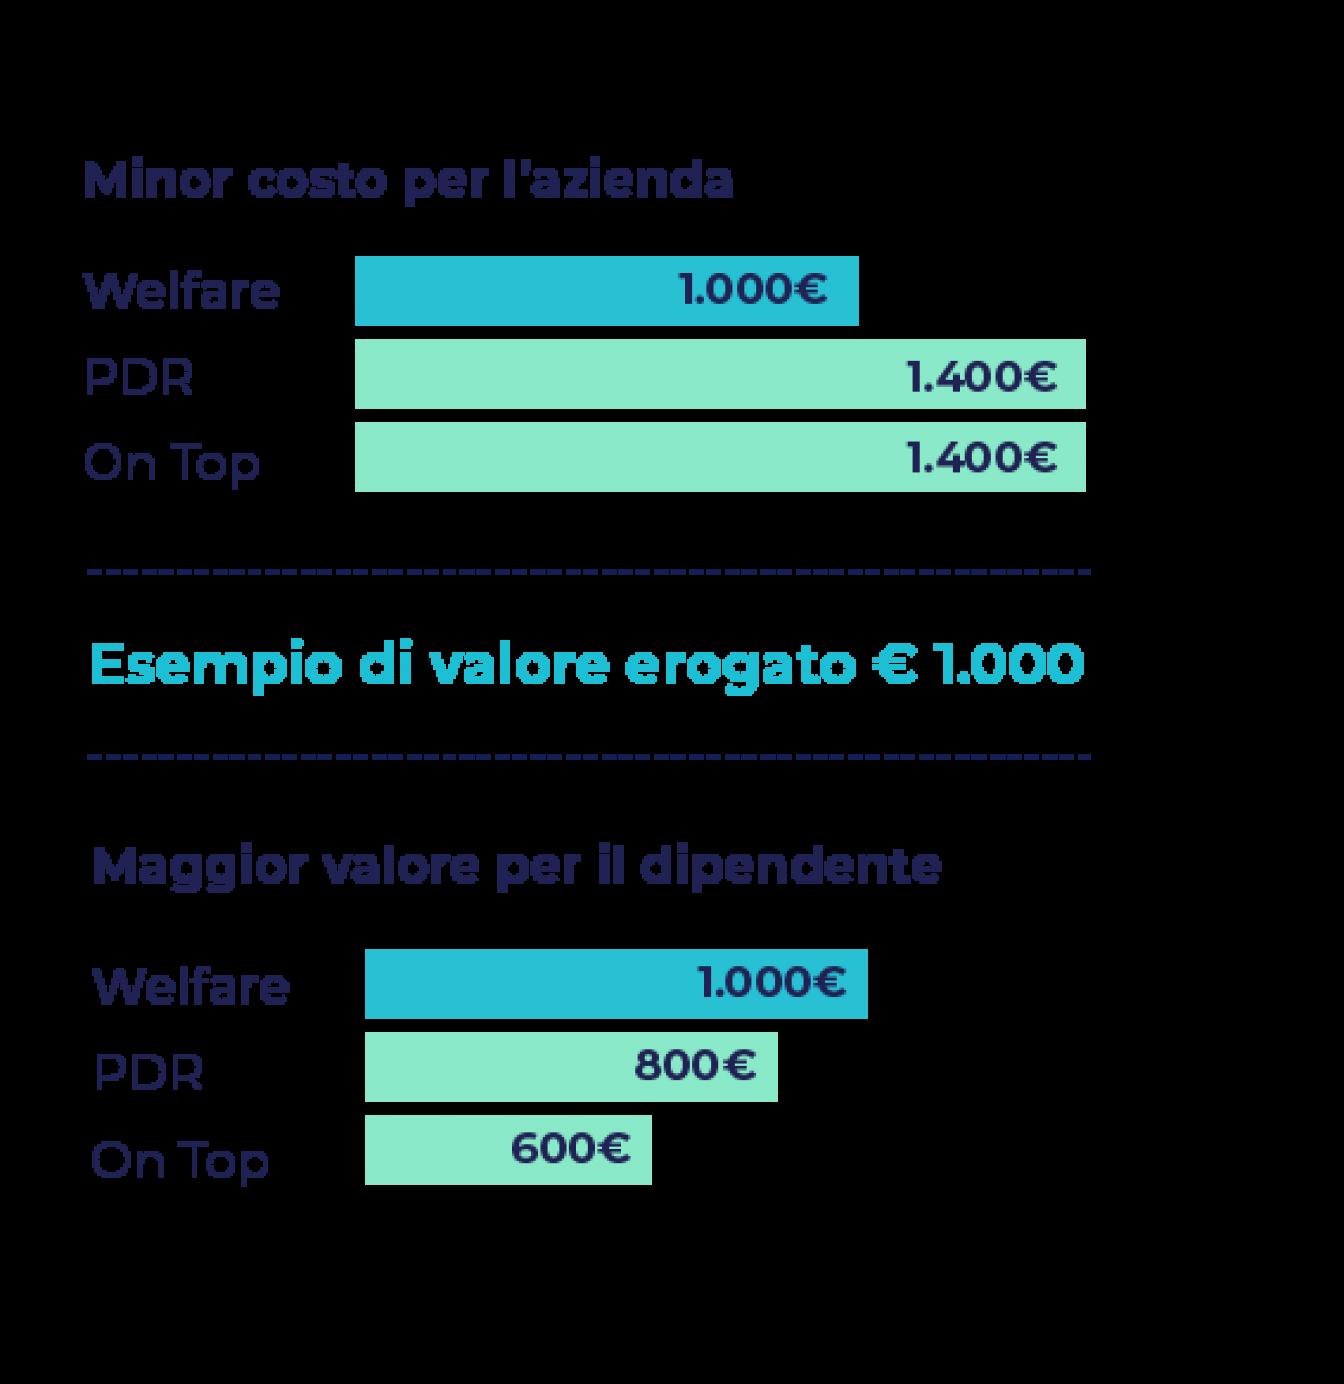 welfare-aziendale-easy-welfare-edenred-infografica-vantaggi-welfare-202105